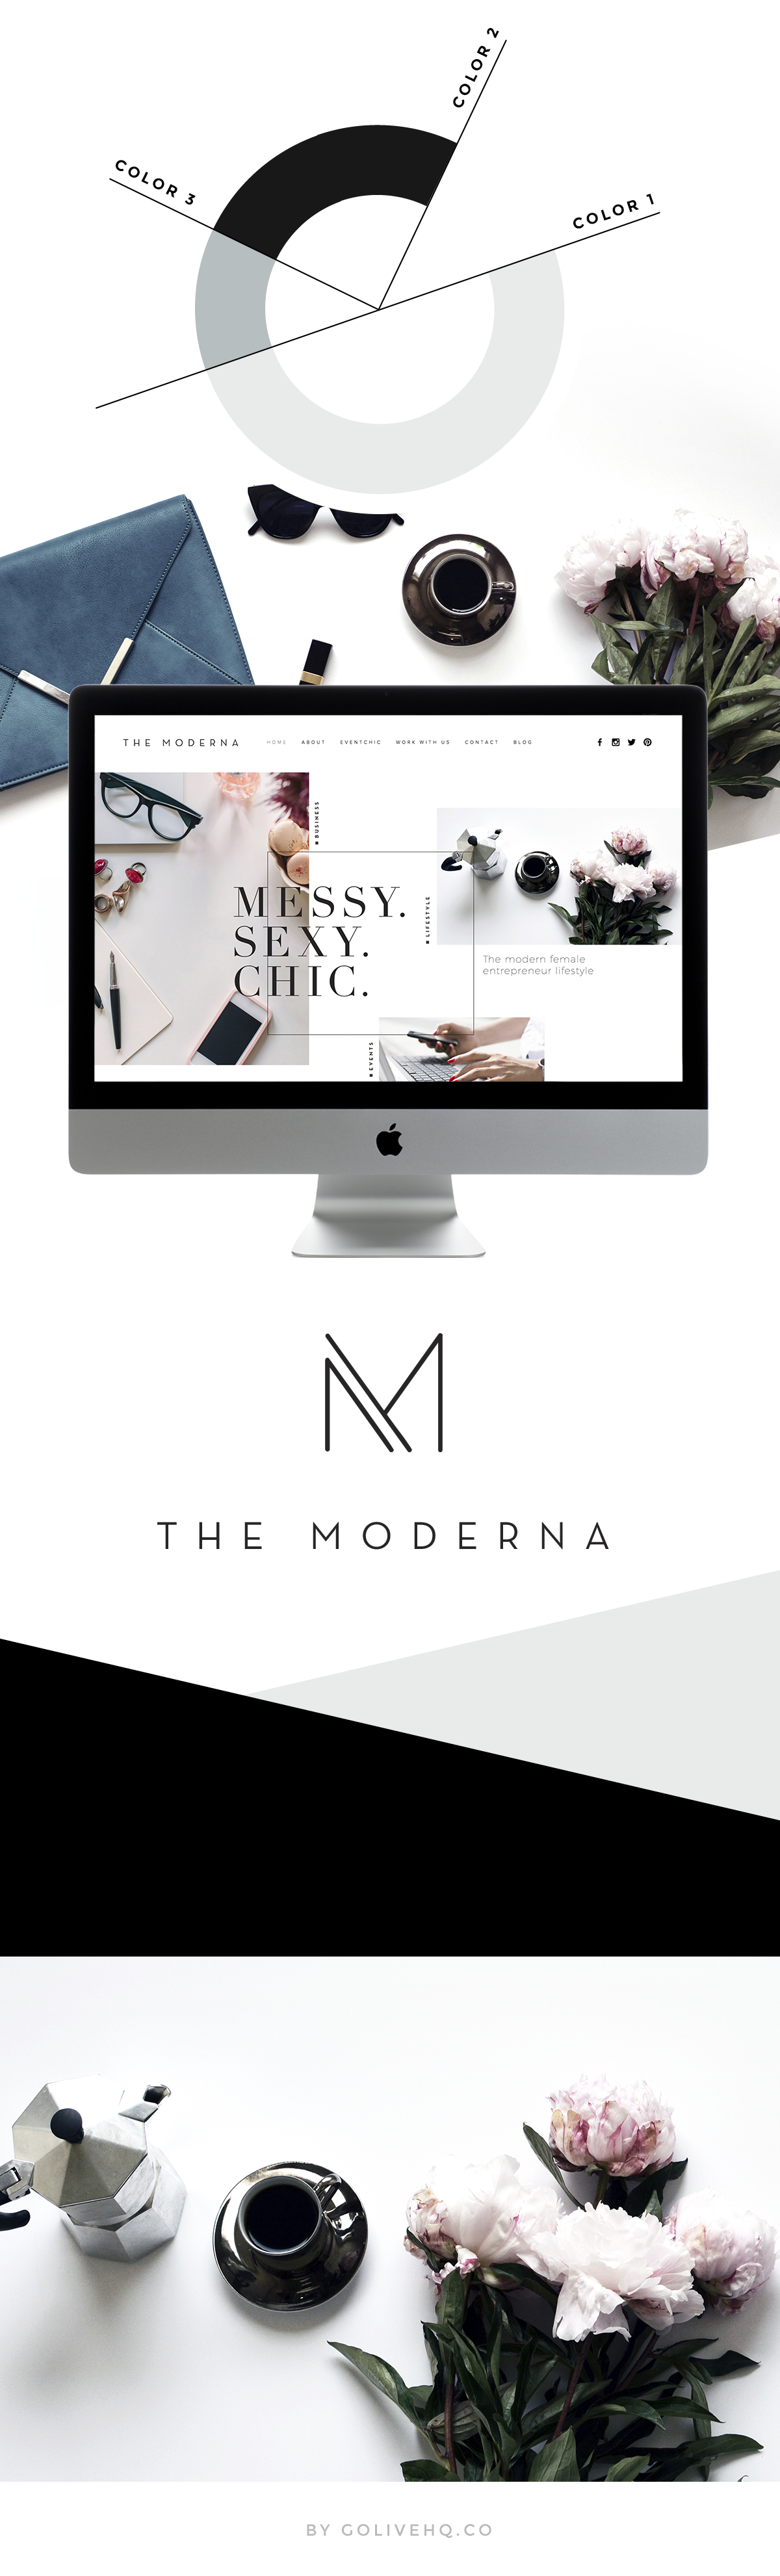 modern squarespace website design | | by GOLIVEHQ.CO